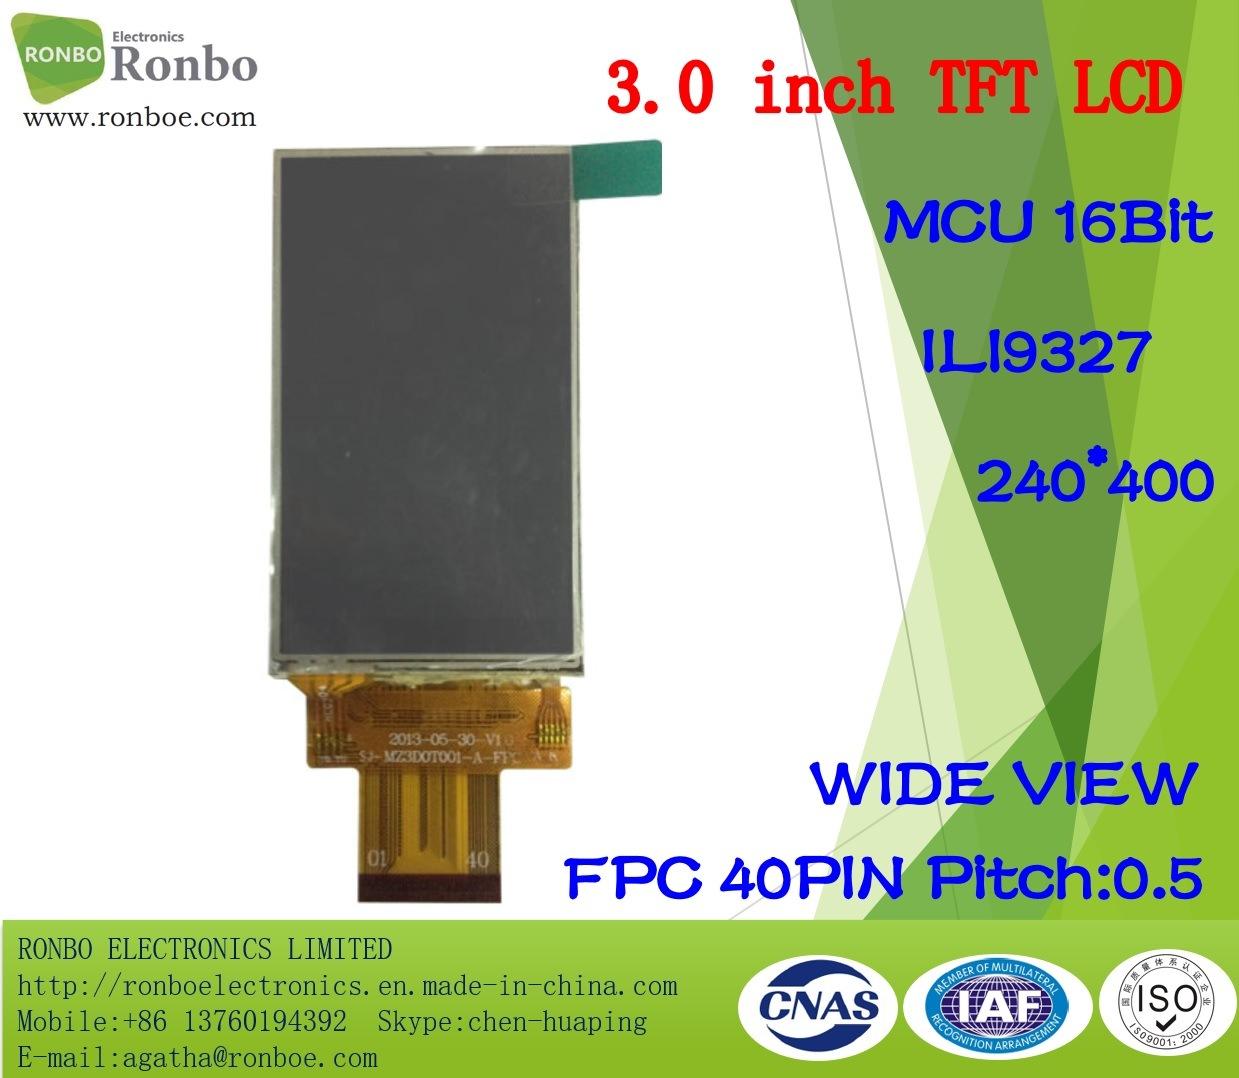 "3.0"" 240*0 MCU 16bit 40pin, Ili9327, TFT LCD Touch Screen"